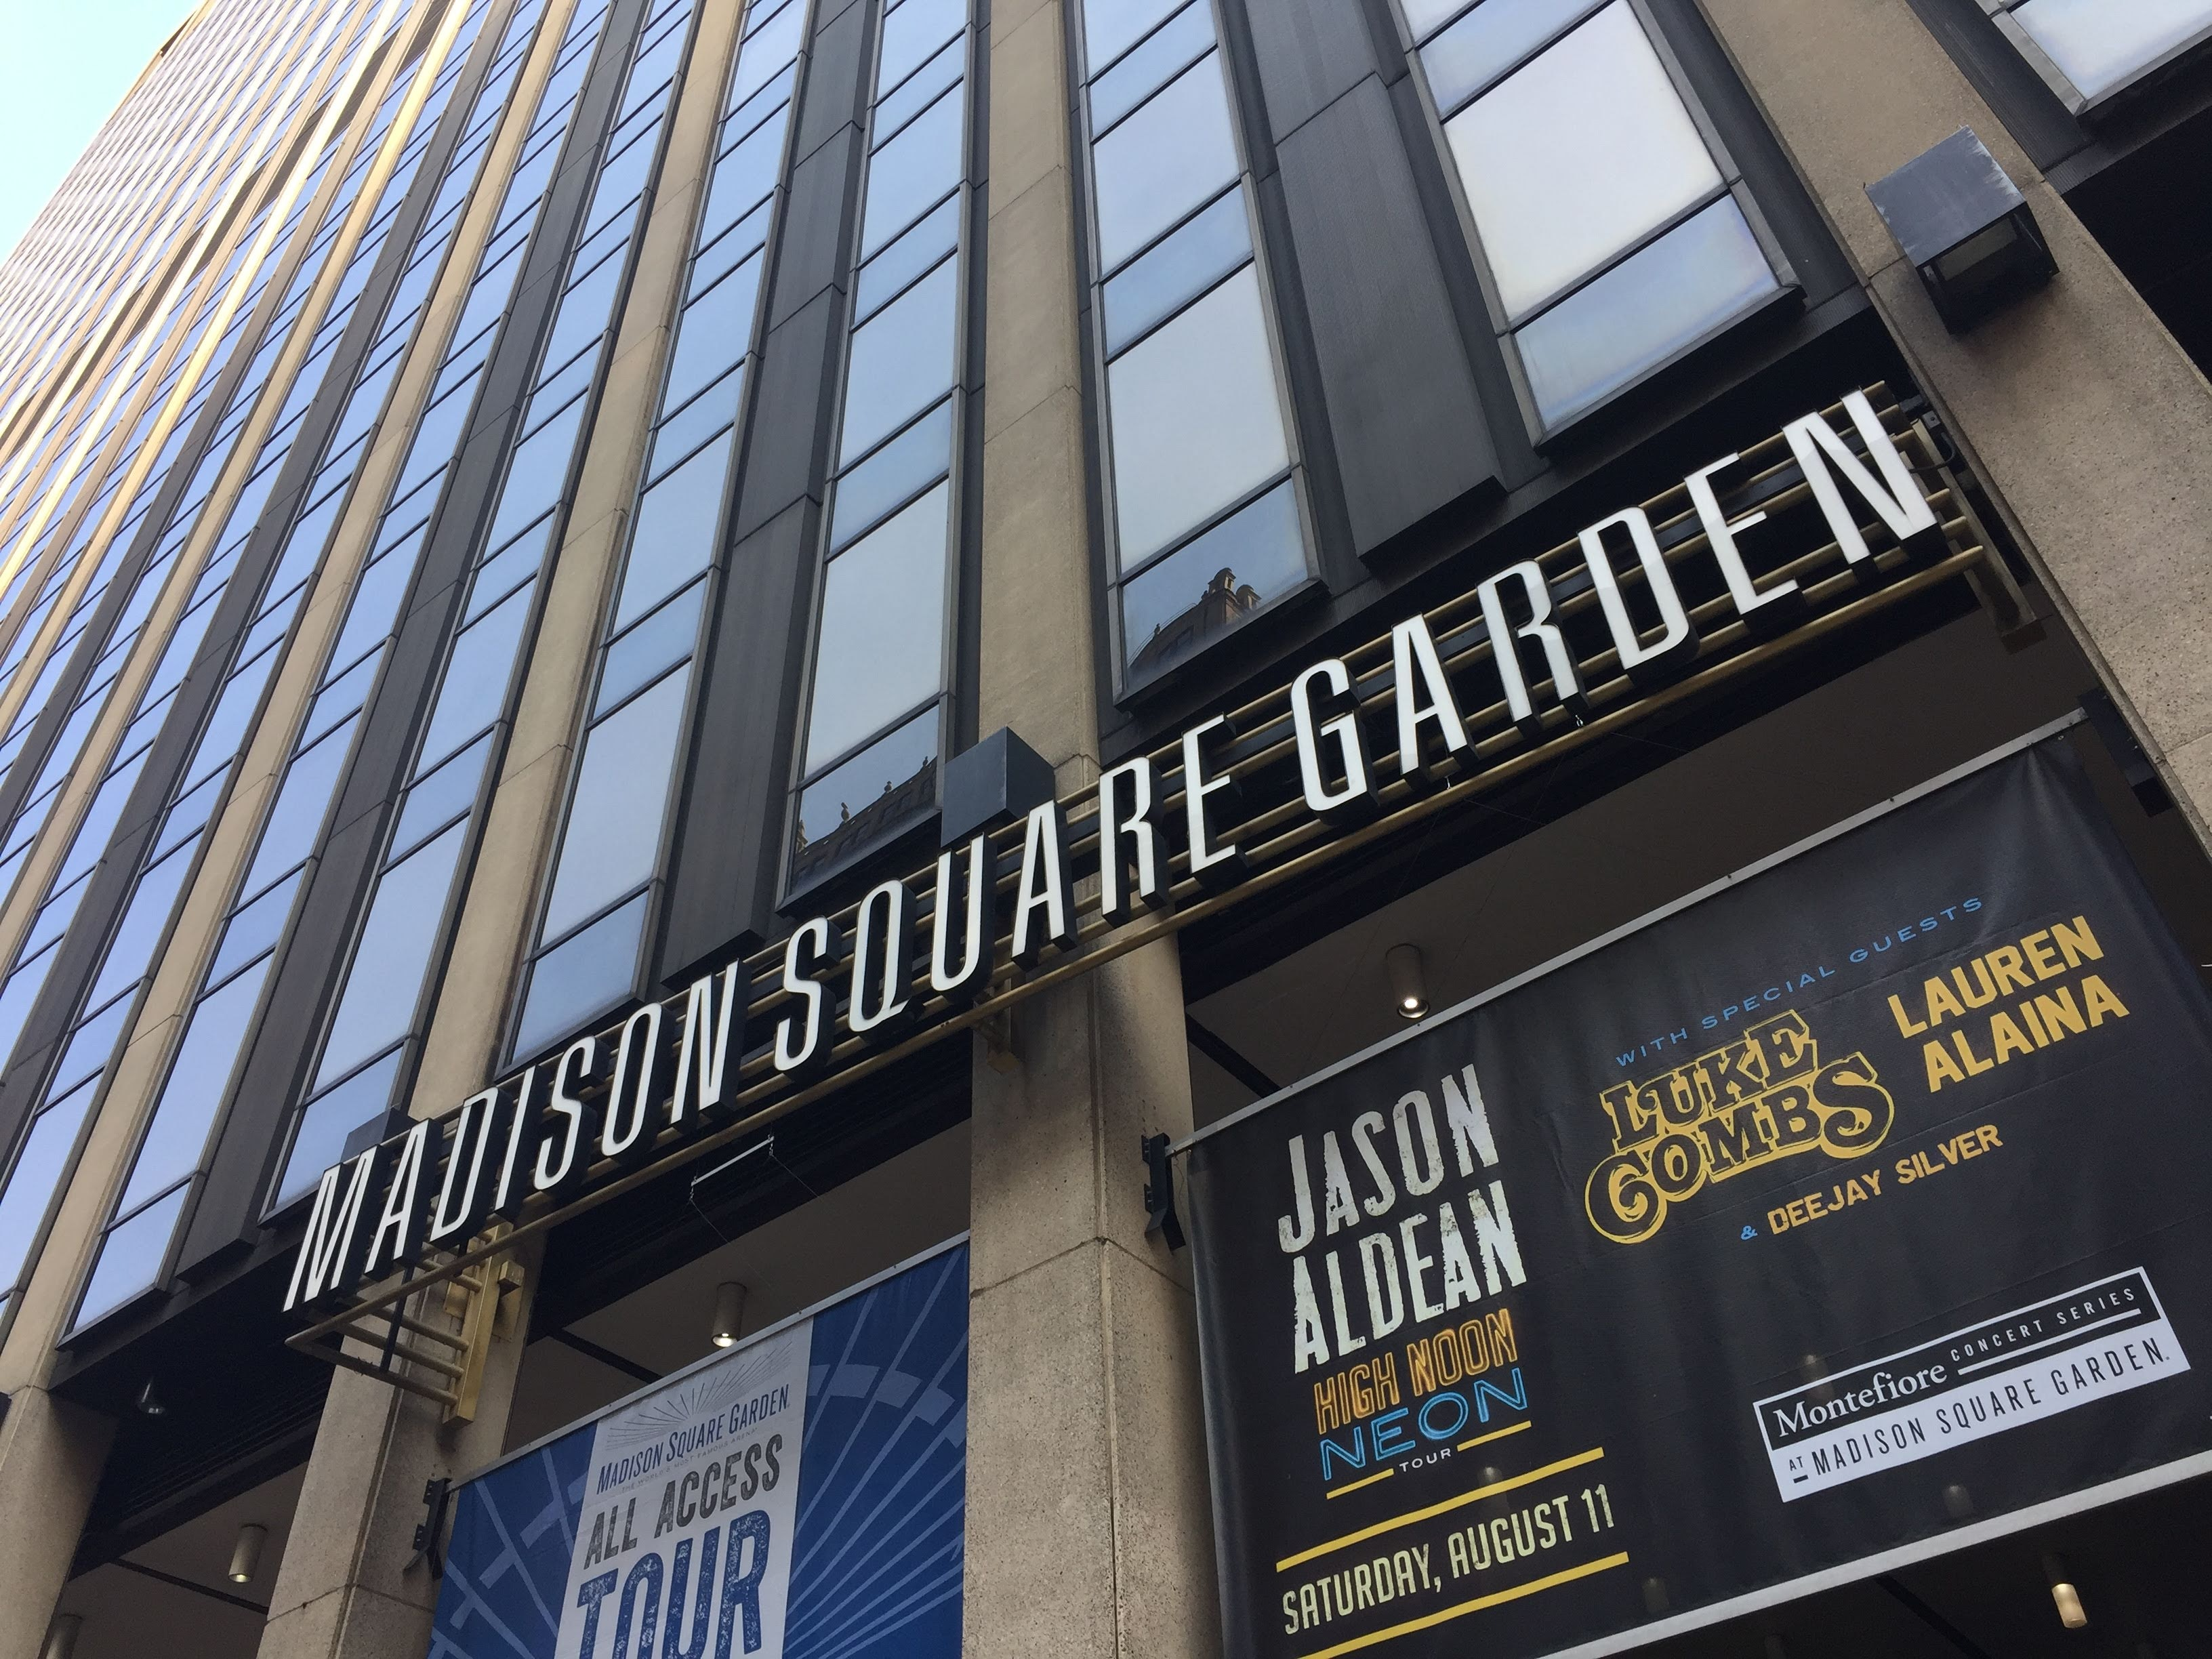 Madison Square Garden Map Location, Similar Photos, Madison Square Garden Map Location